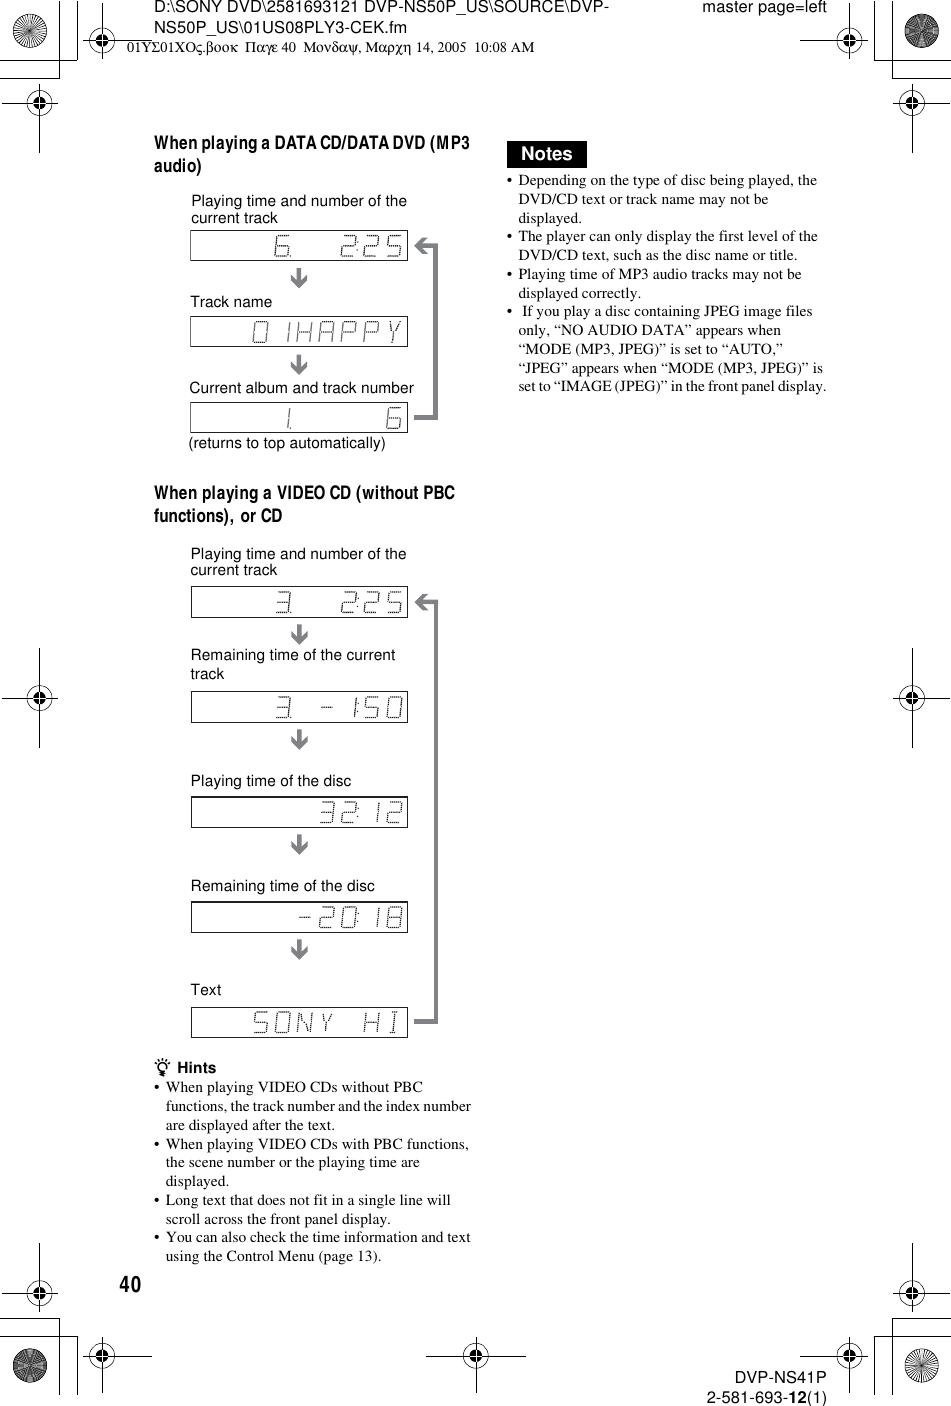 Sony Dvp Ns50P Users Manual